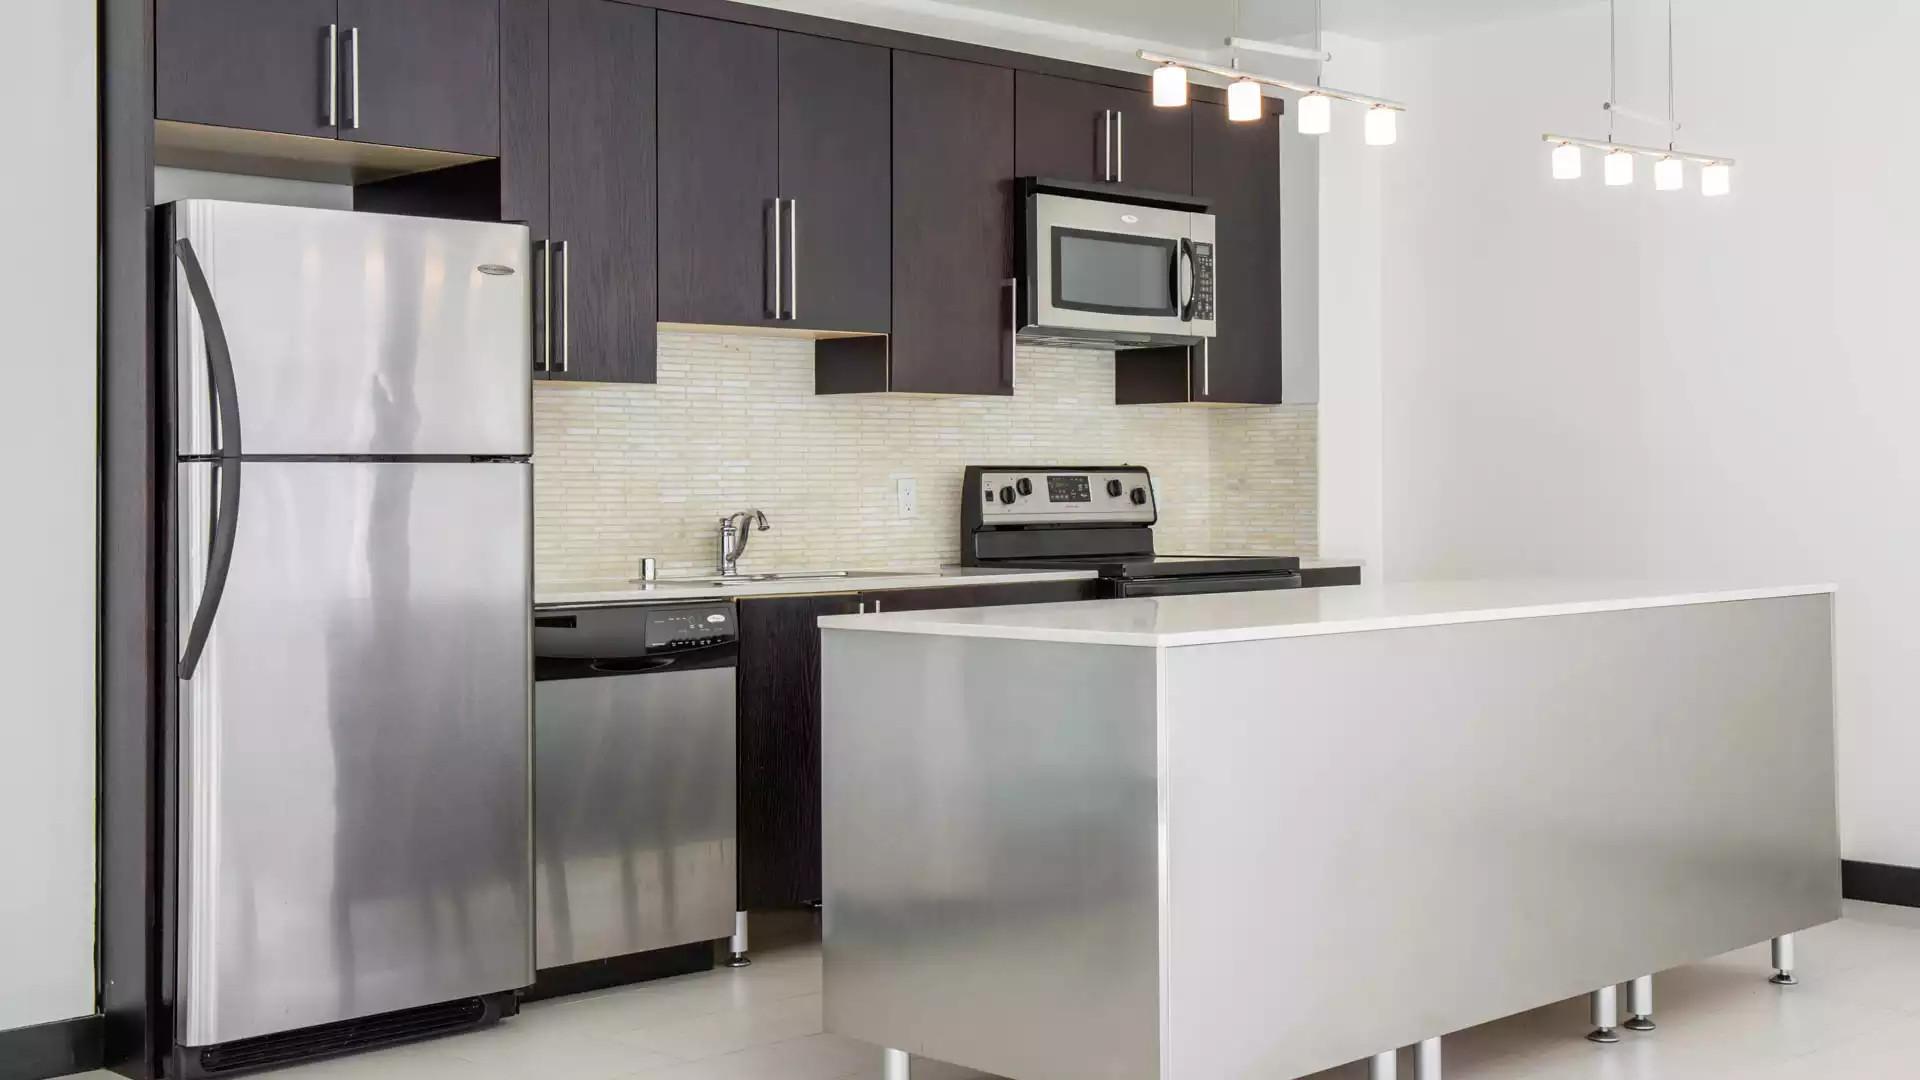 Milano Lofts Apartments - Los Angeles, CA